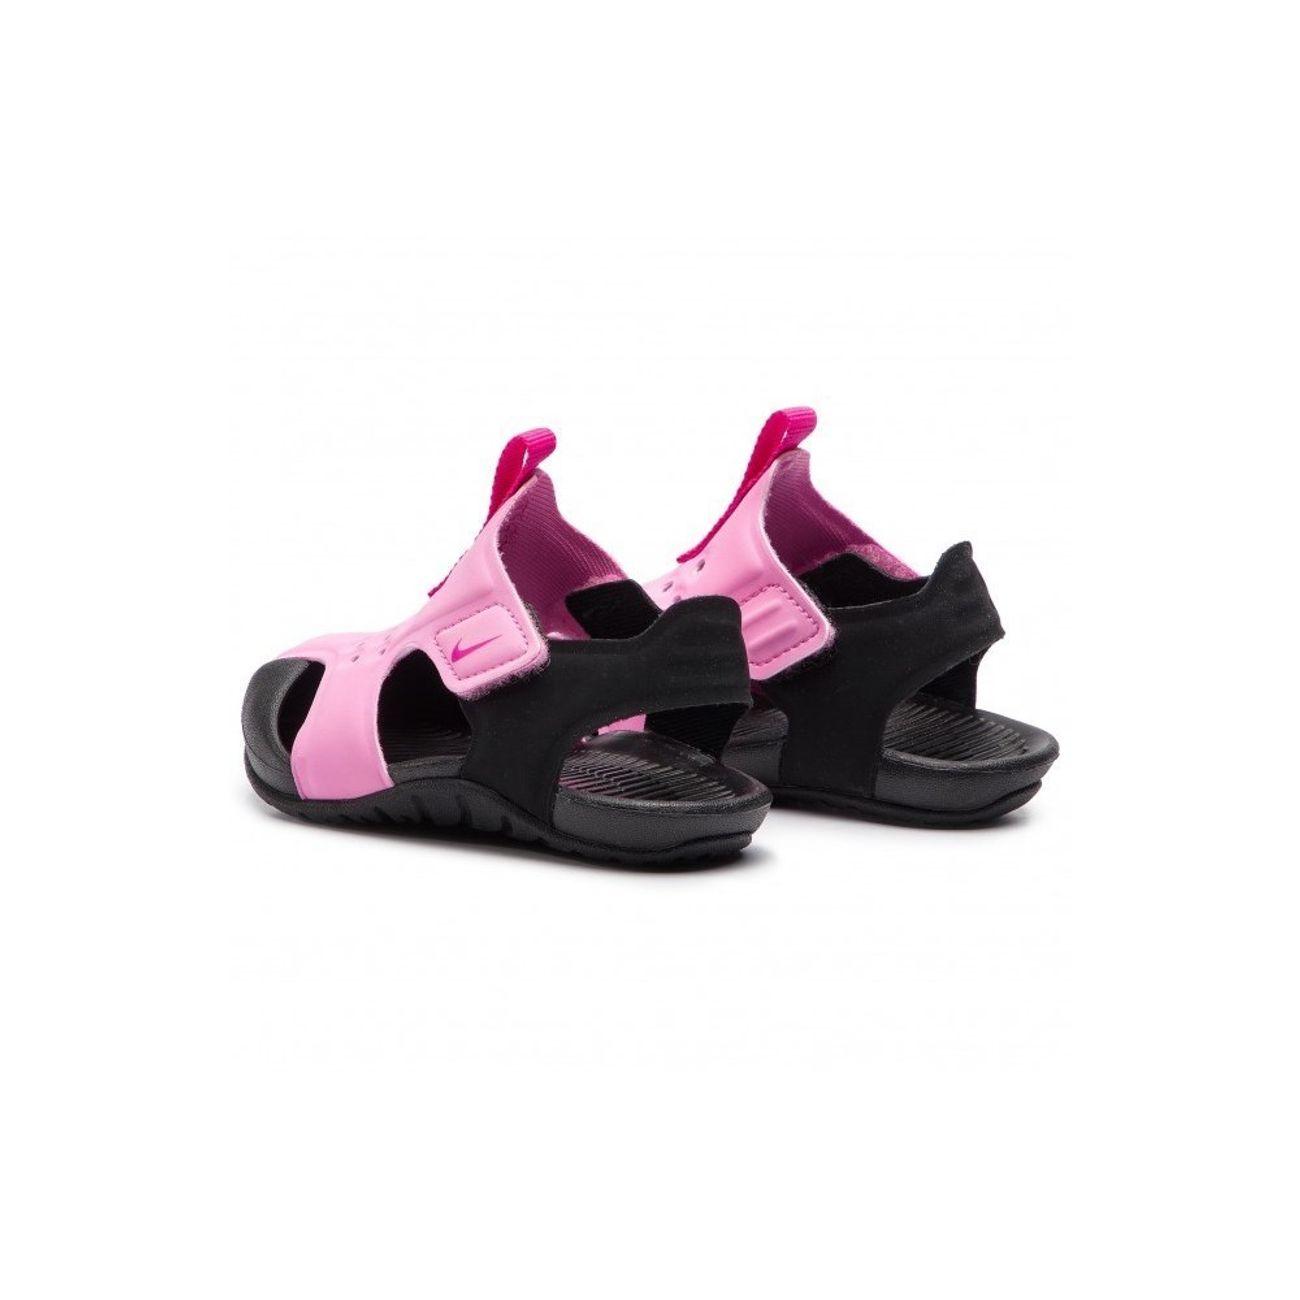 Mode- Lifestyle Bébé NIKE Nike Sunray Protect 2